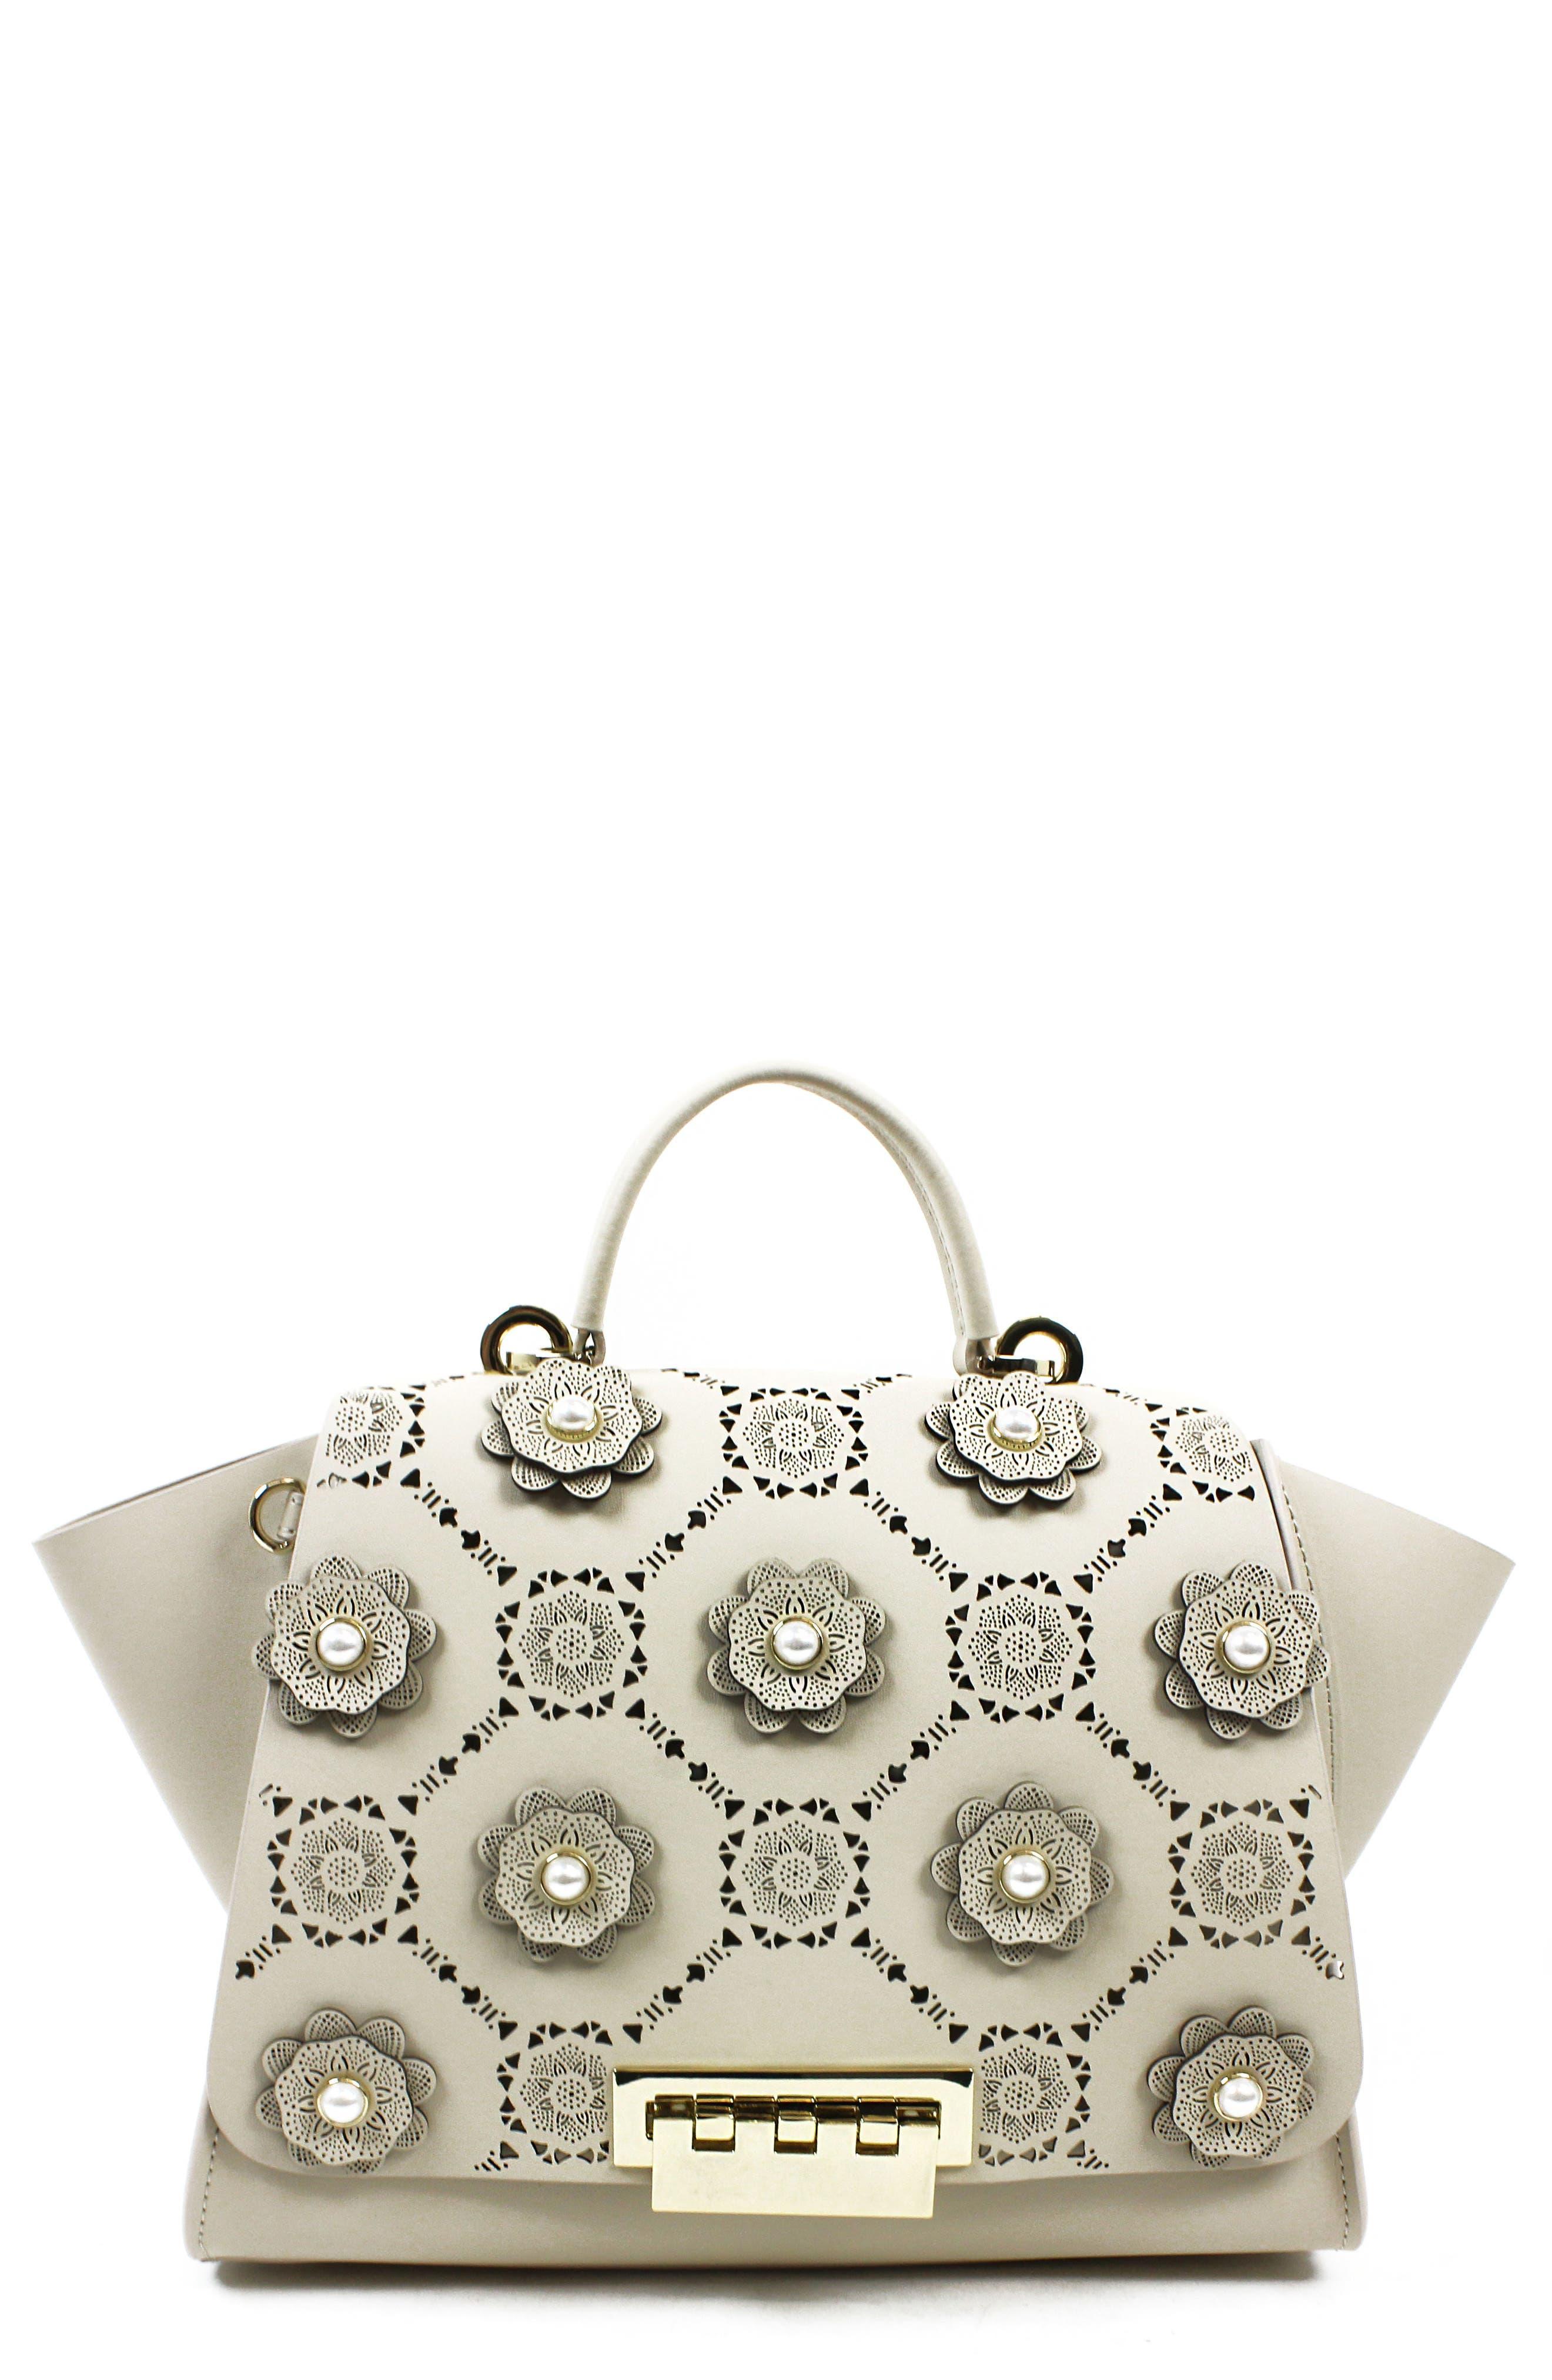 Main Image - ZAC Zac Posen Eartha Iconic Soft Top Handle Handbag